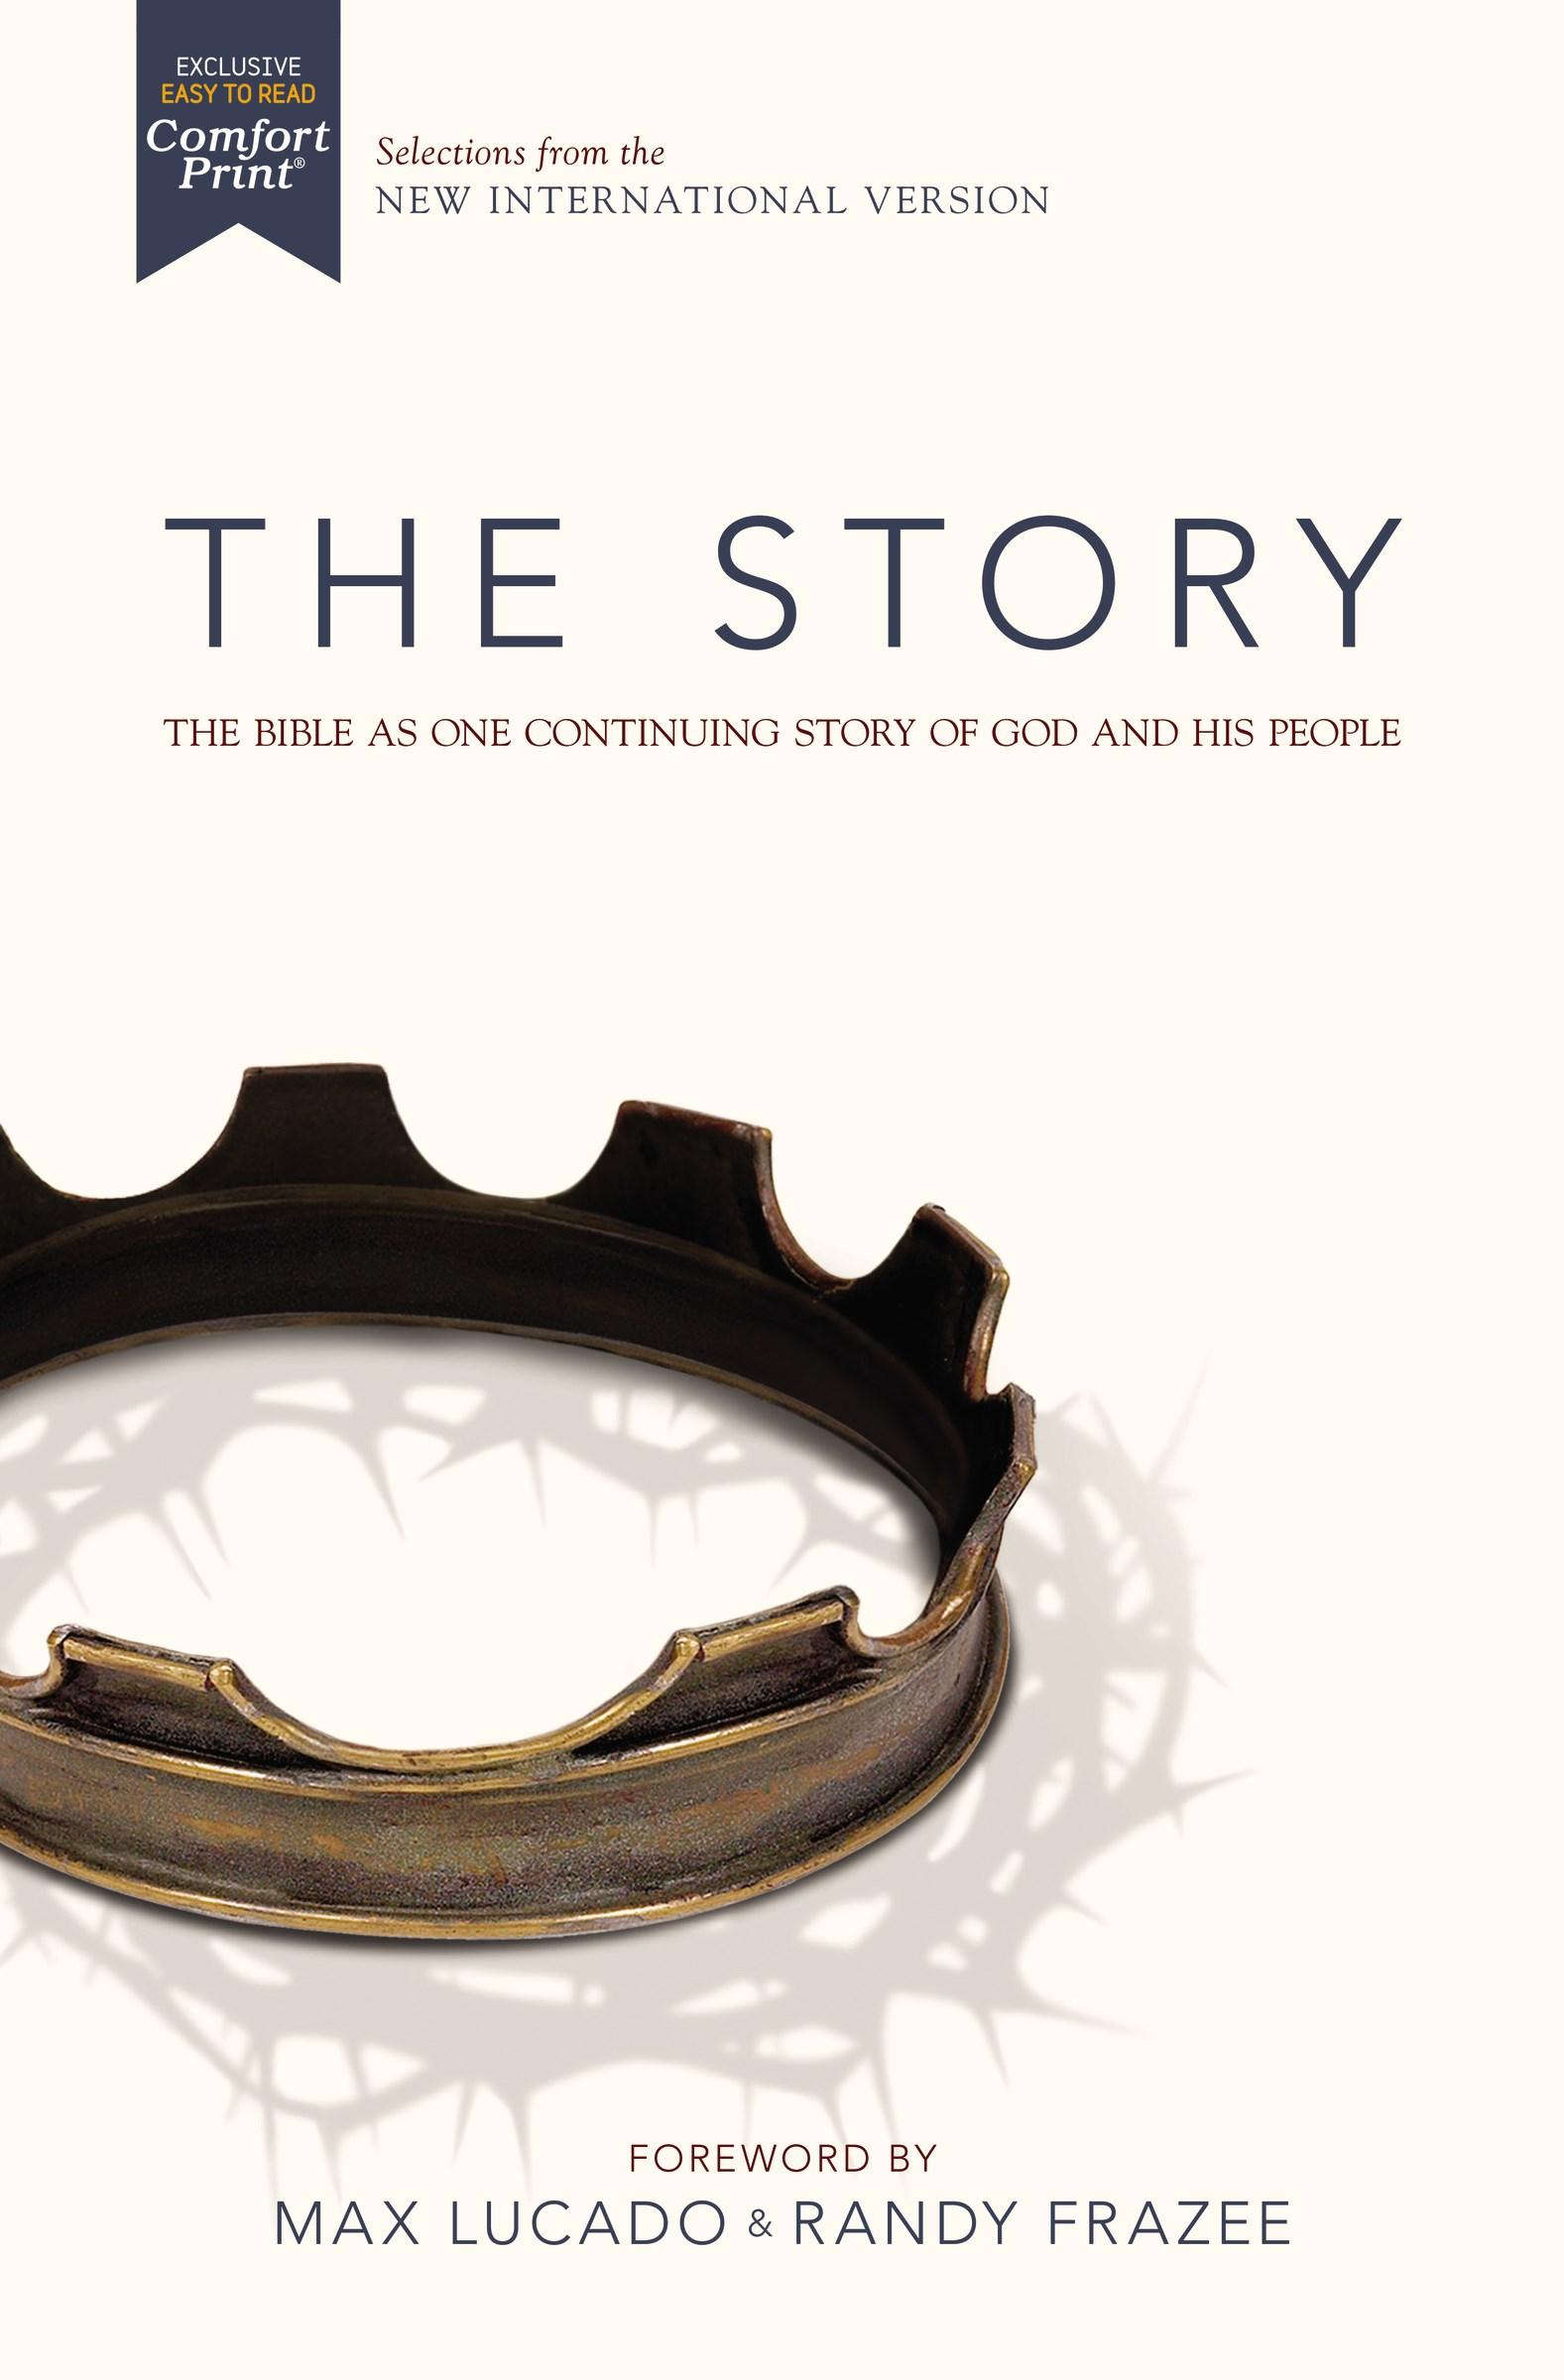 NIV The Story (Comfort Print)-Hardcover